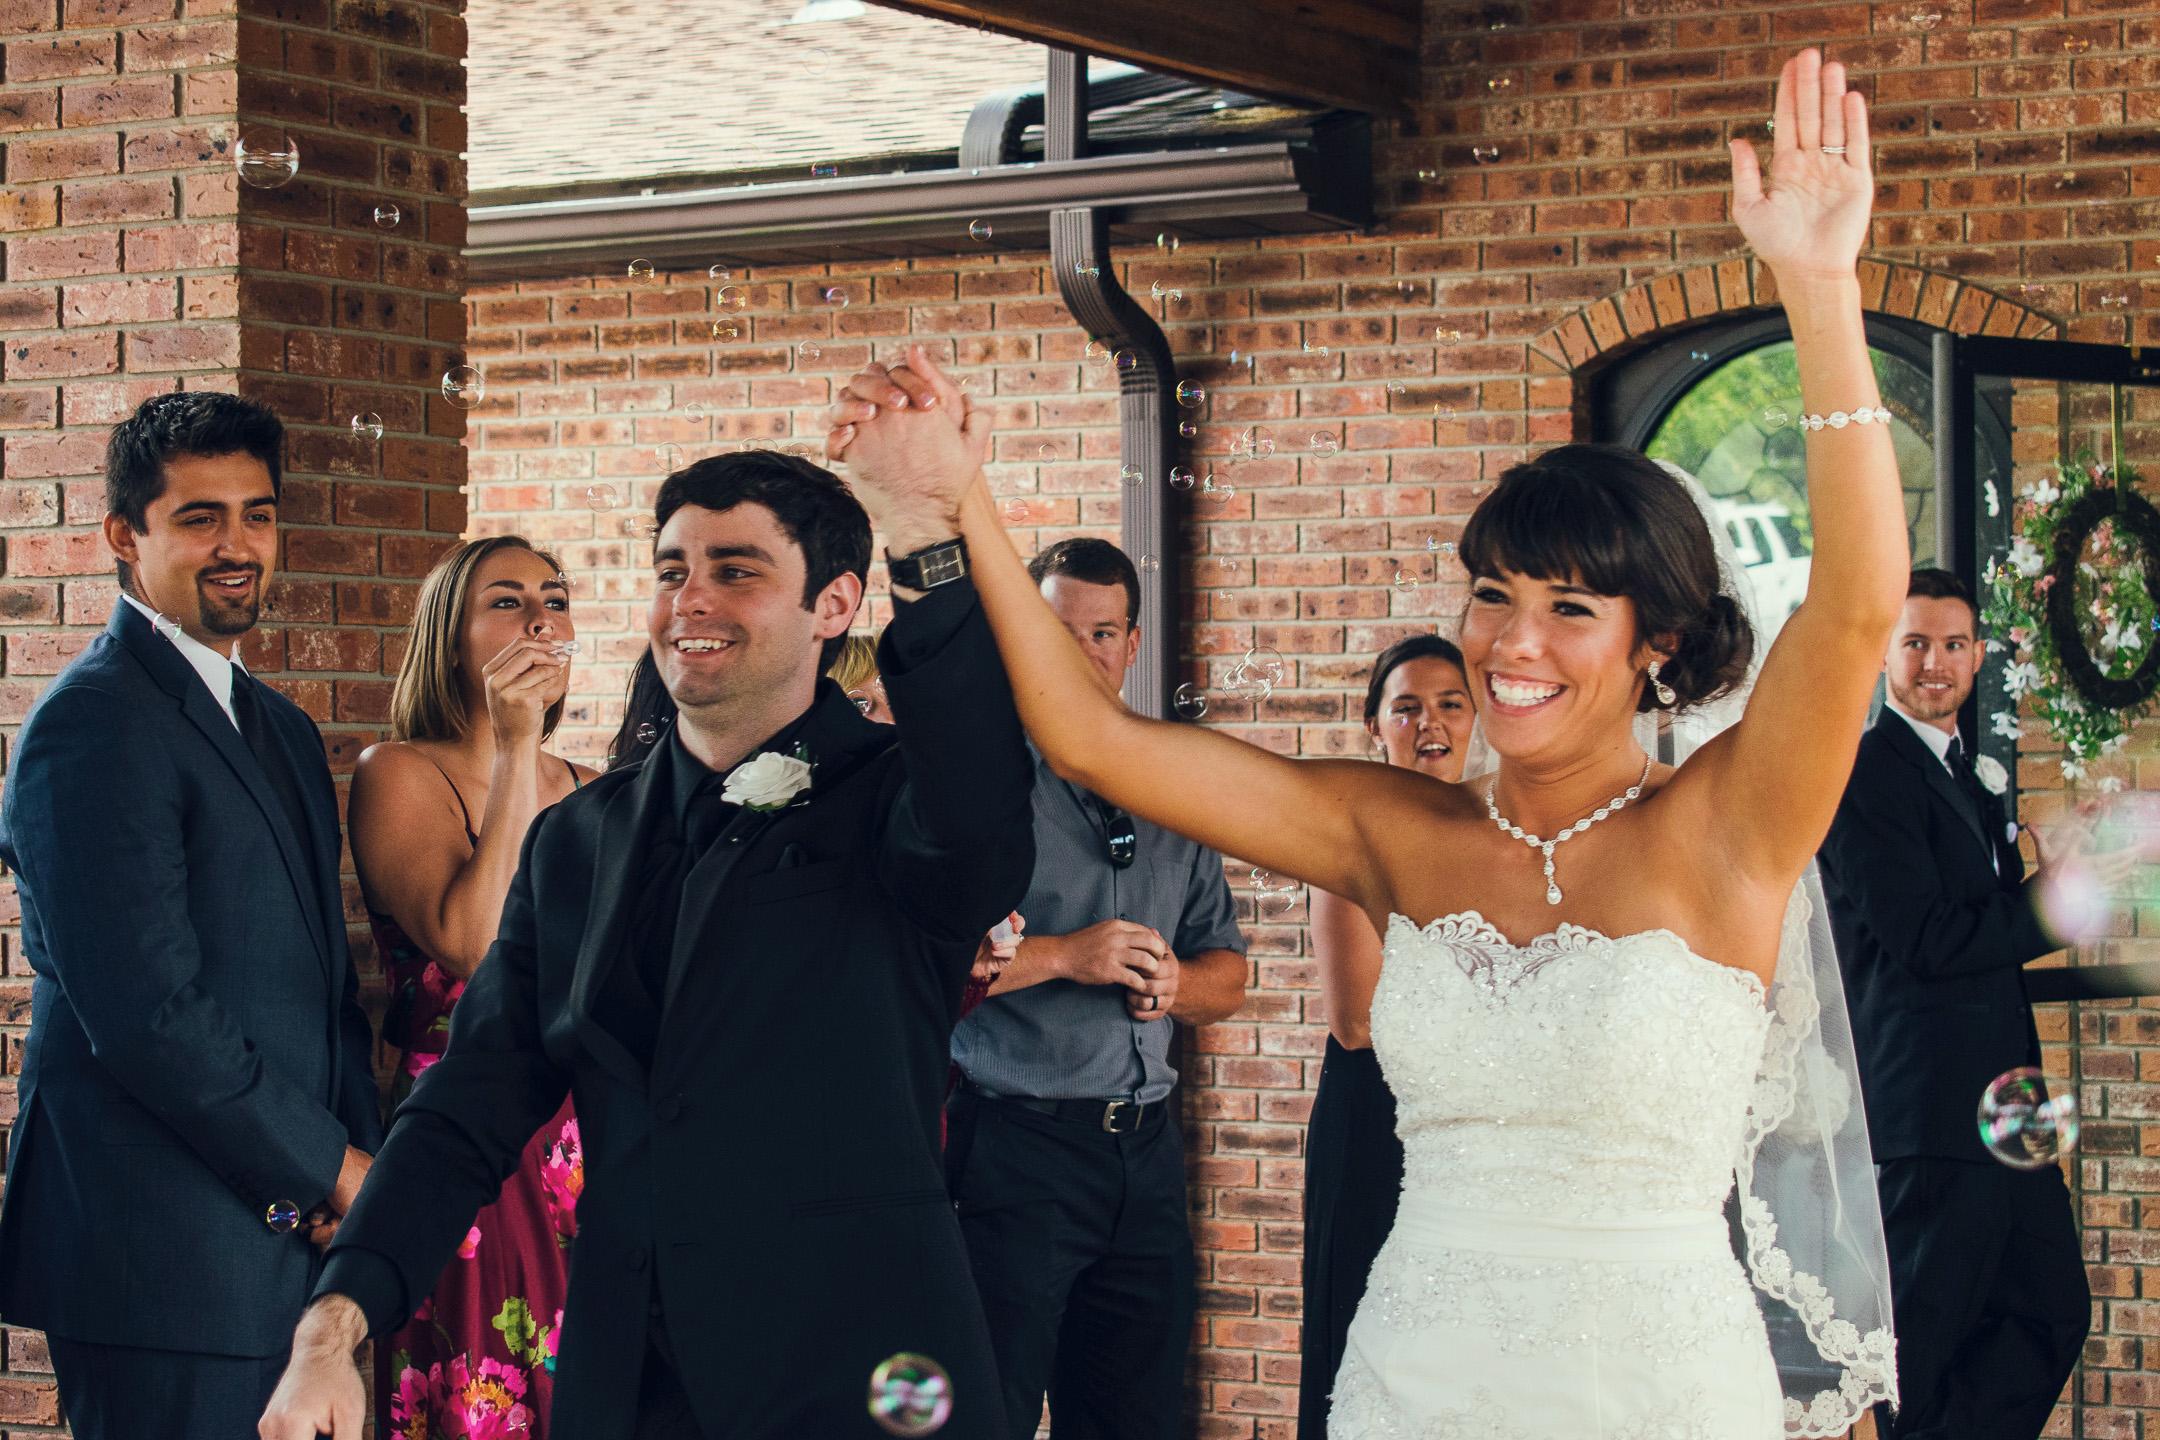 Conner_Wedding_Edits_Web-251.jpg